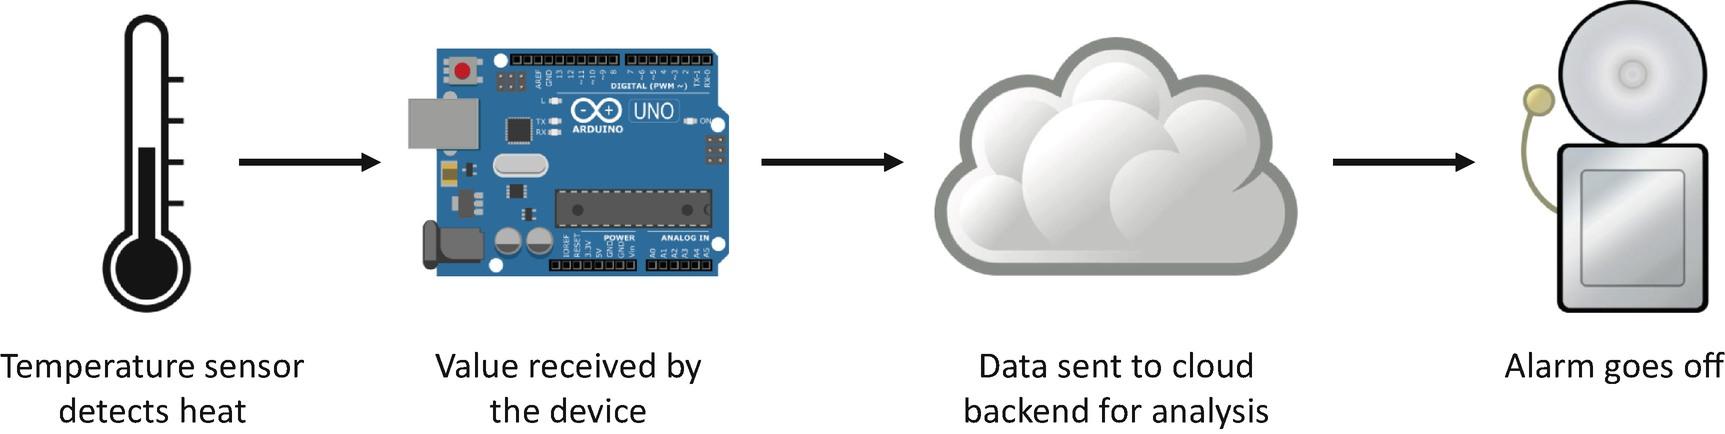 Understanding the Internet of Things and Azure IoT Suite | SpringerLink